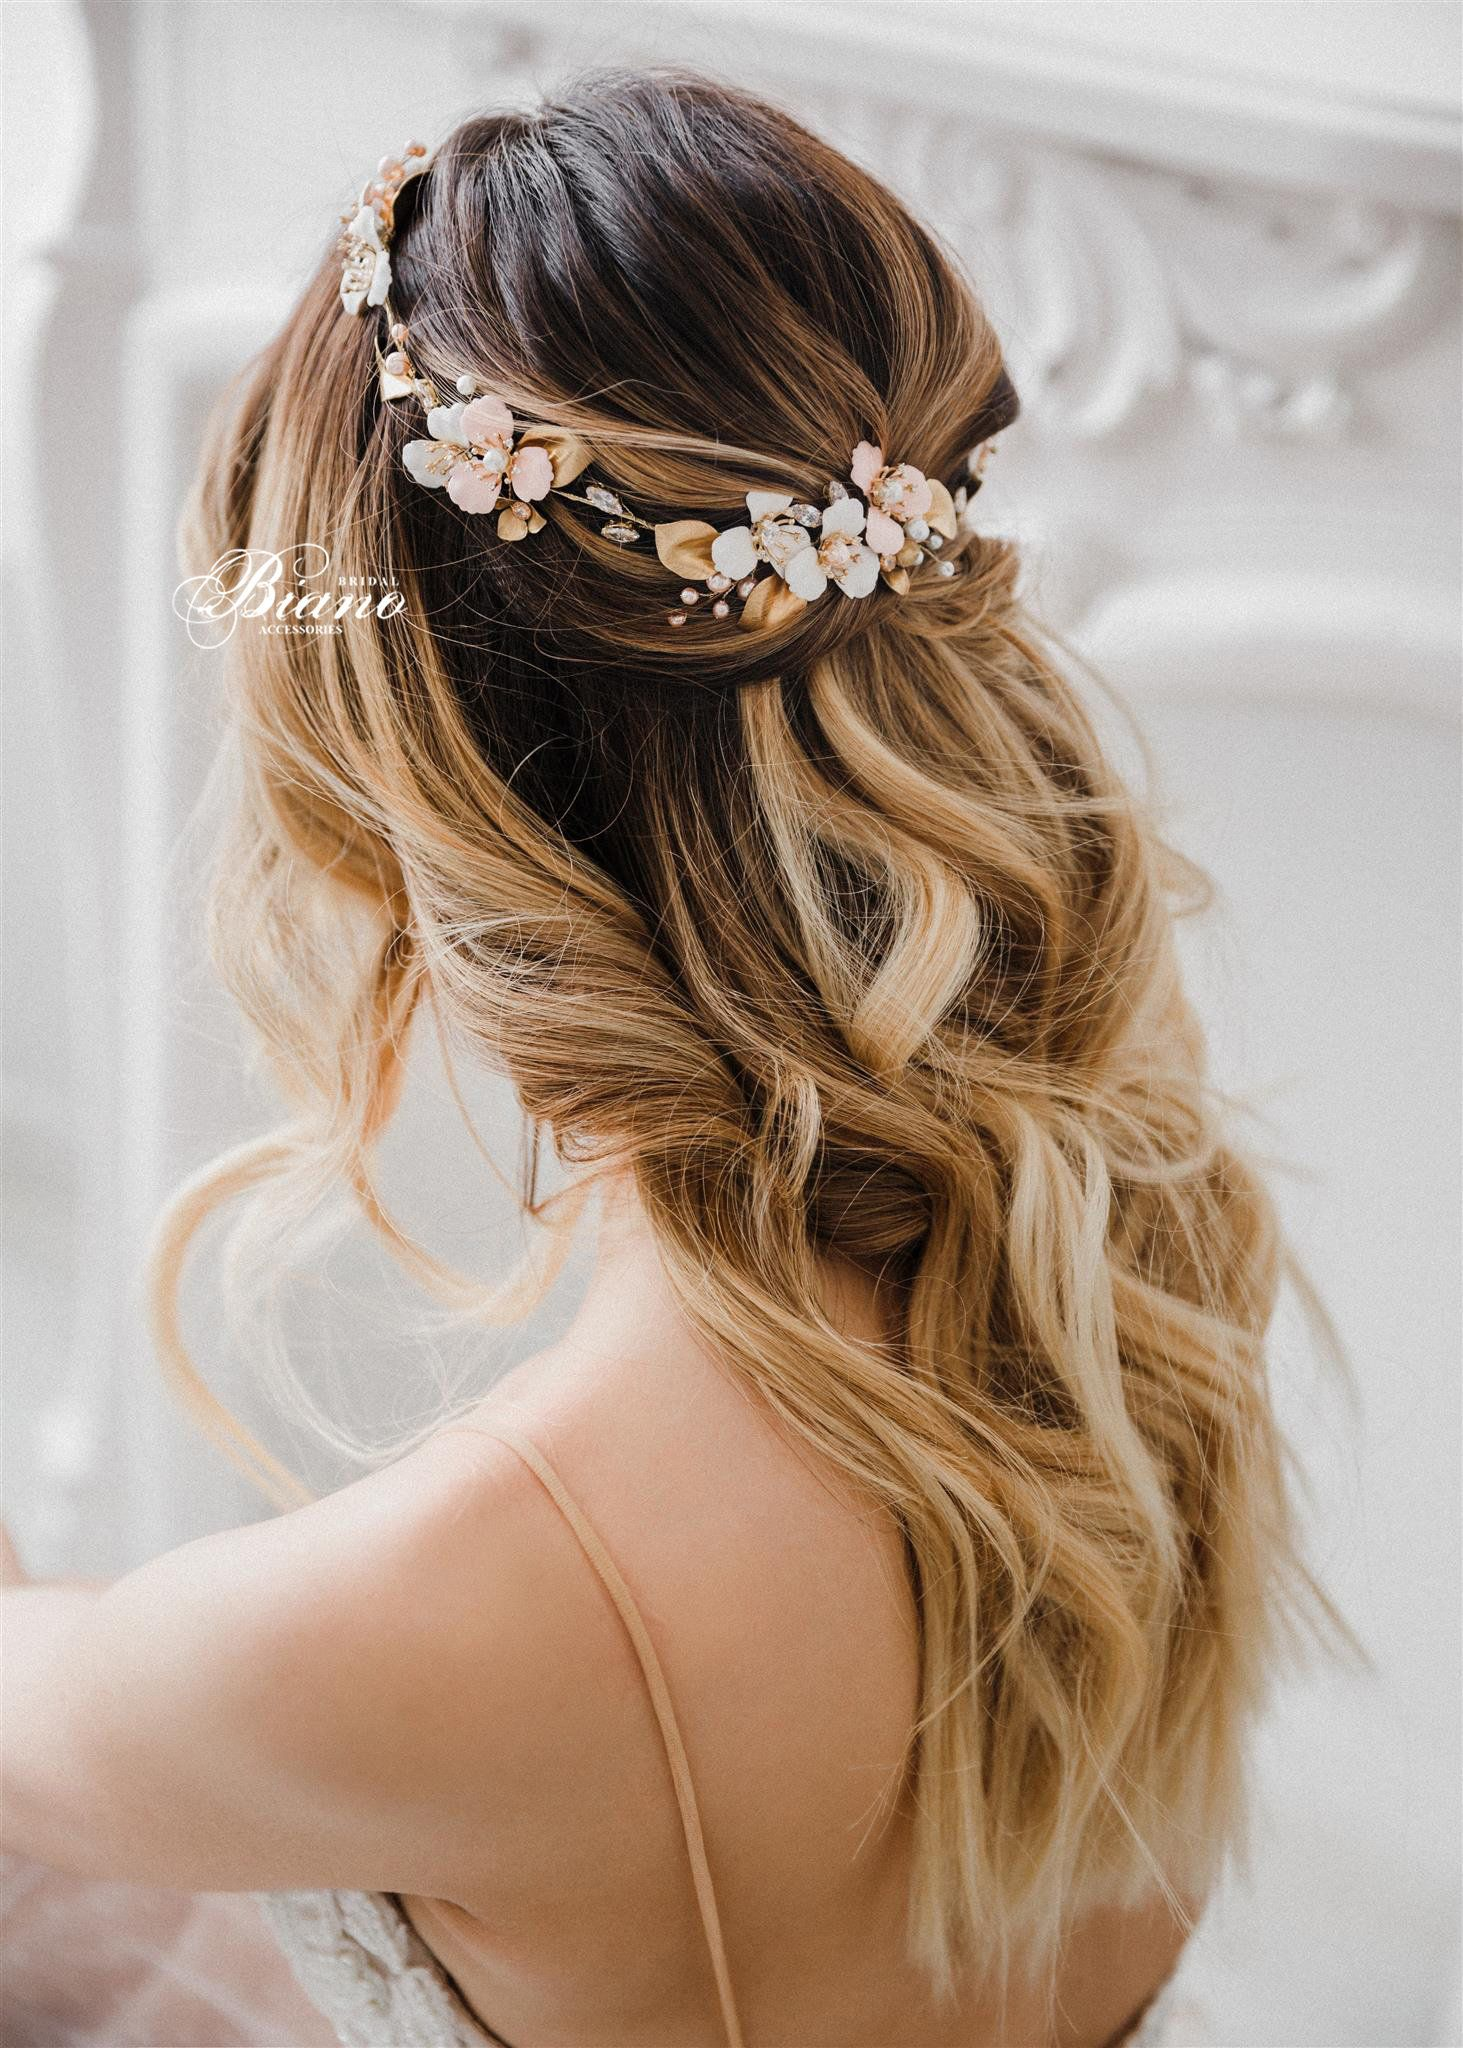 Bridal Headpiece Bridal Halo Headband Wedding Hair Accessory